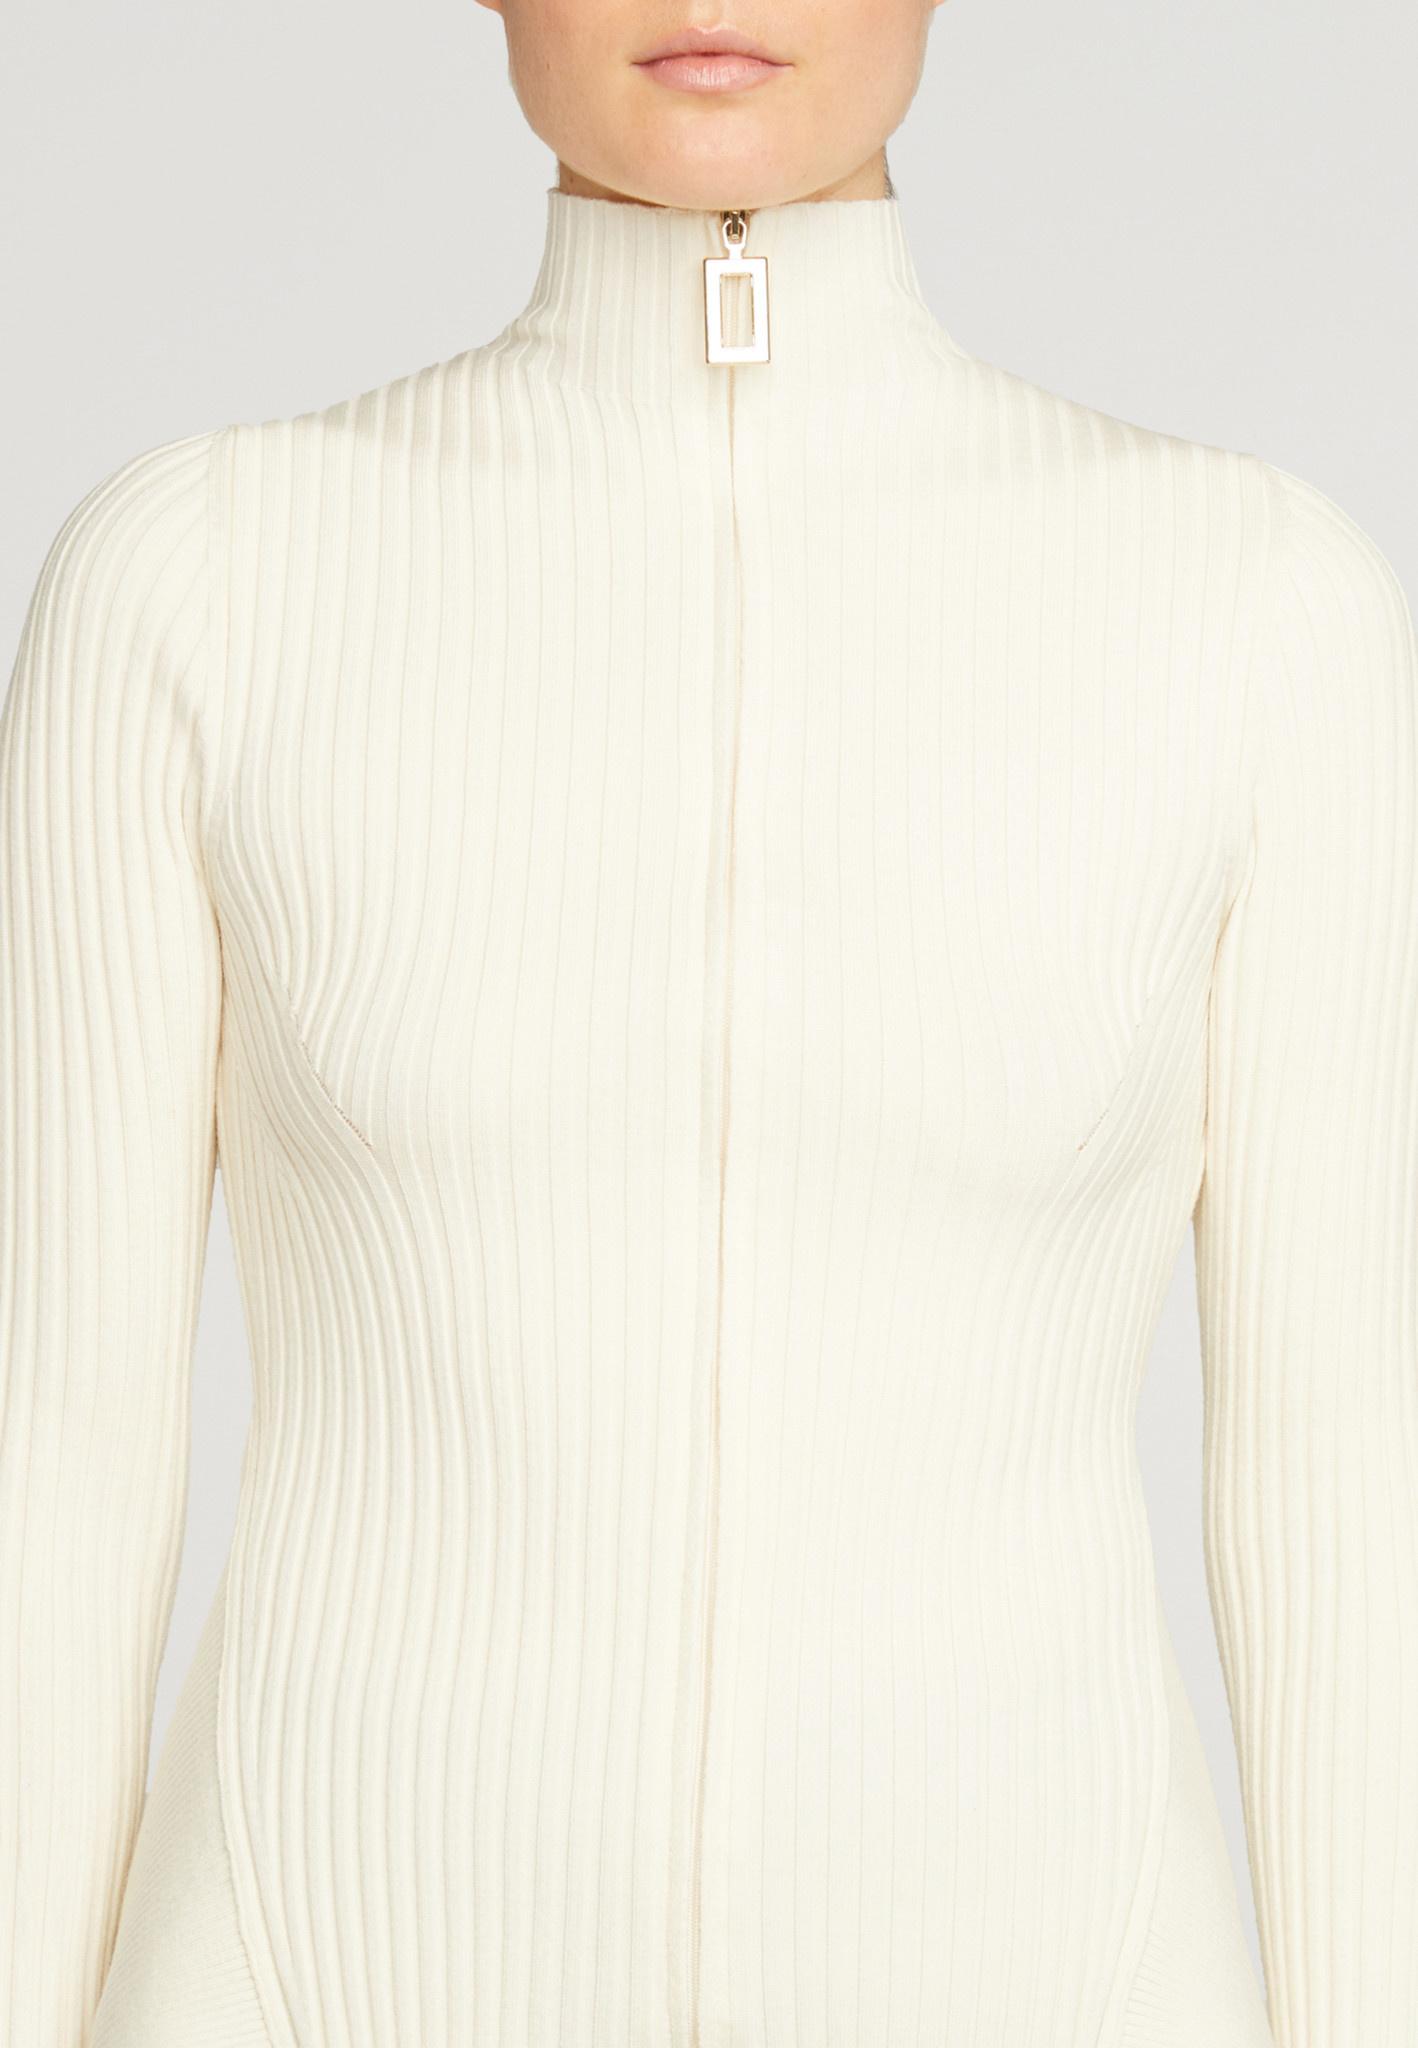 WOLFORD 52818 Thelma Strip Cardigan